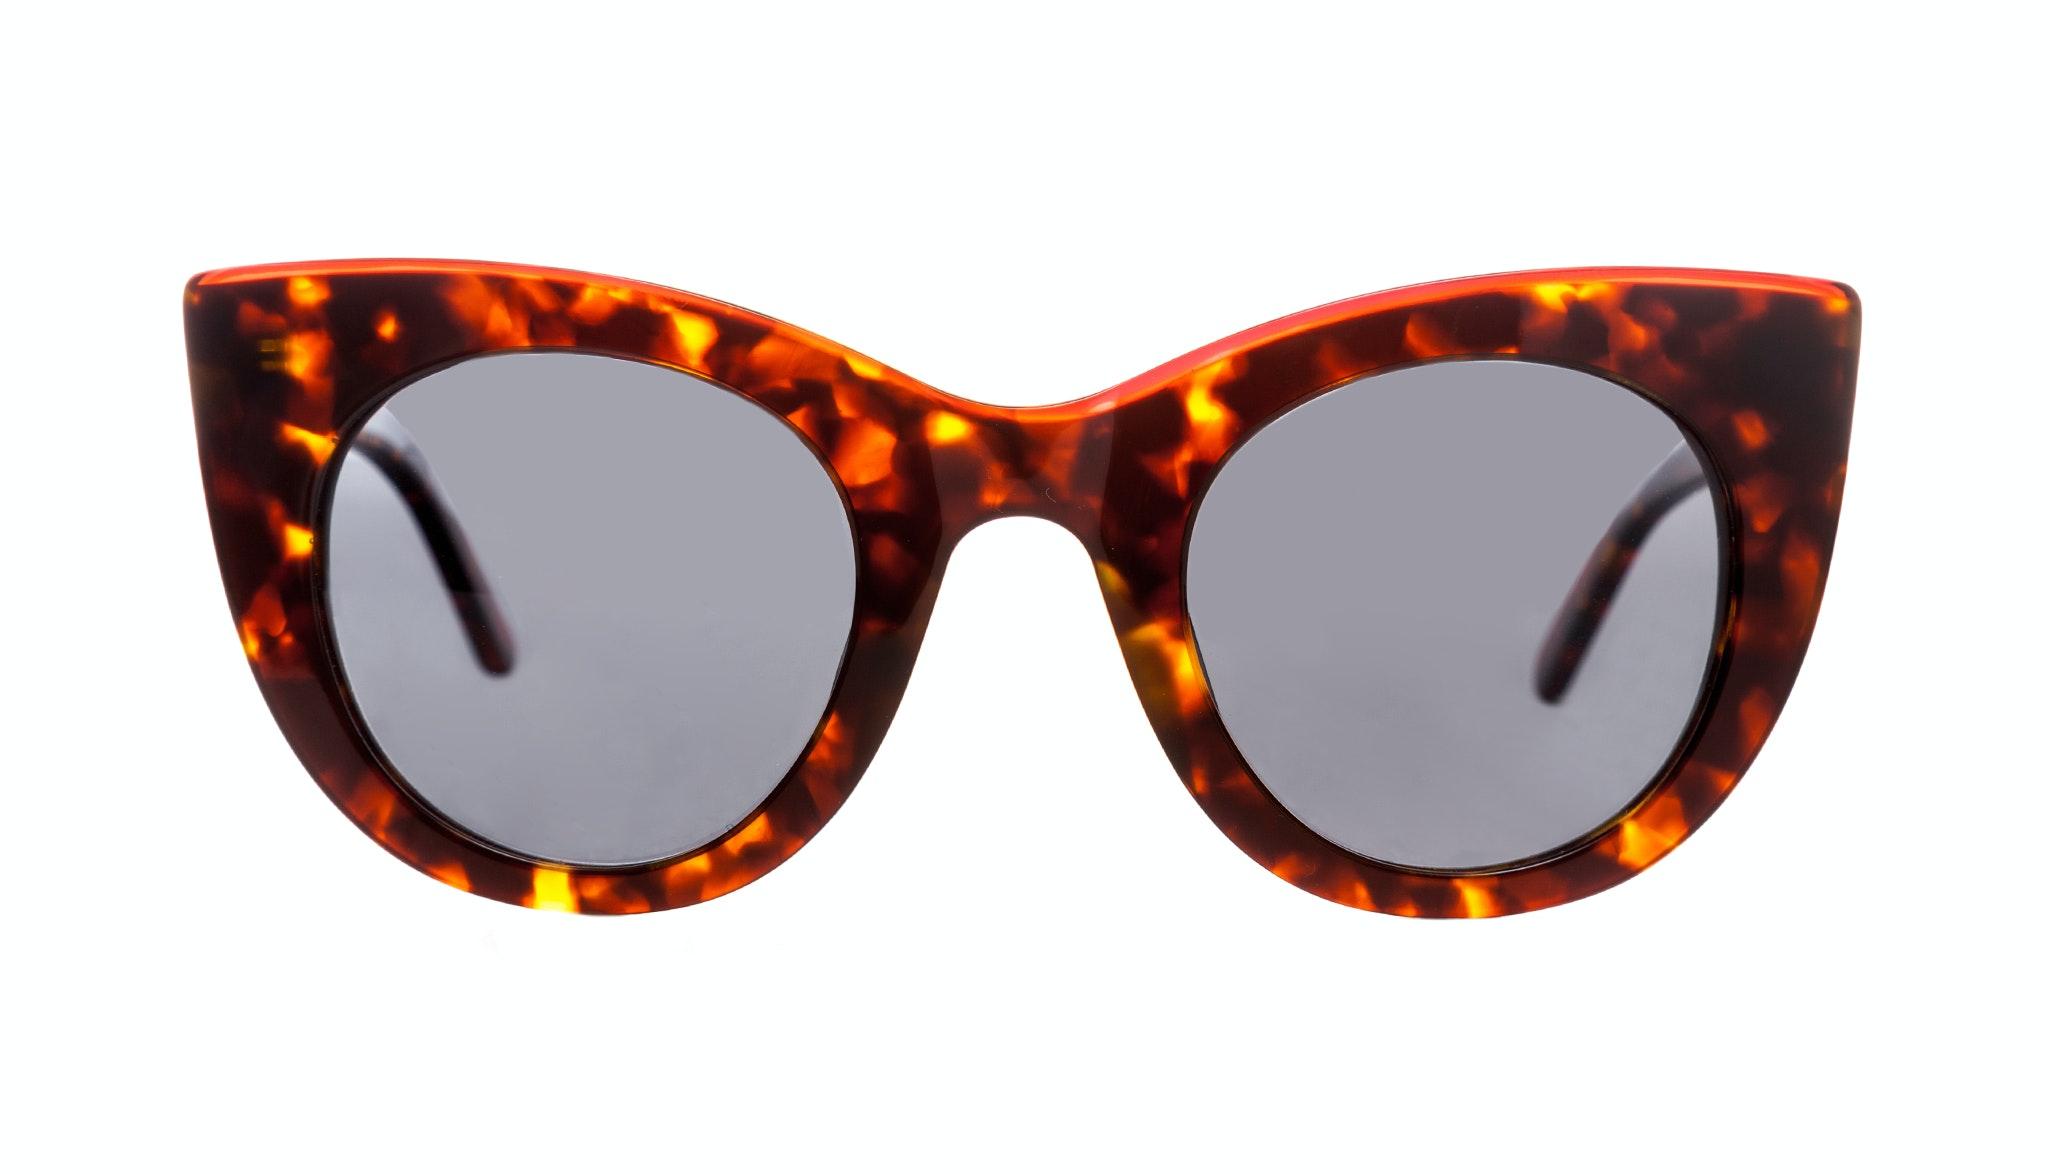 Affordable Fashion Glasses Cat Eye Sunglasses Women Glam Diamond Sepia